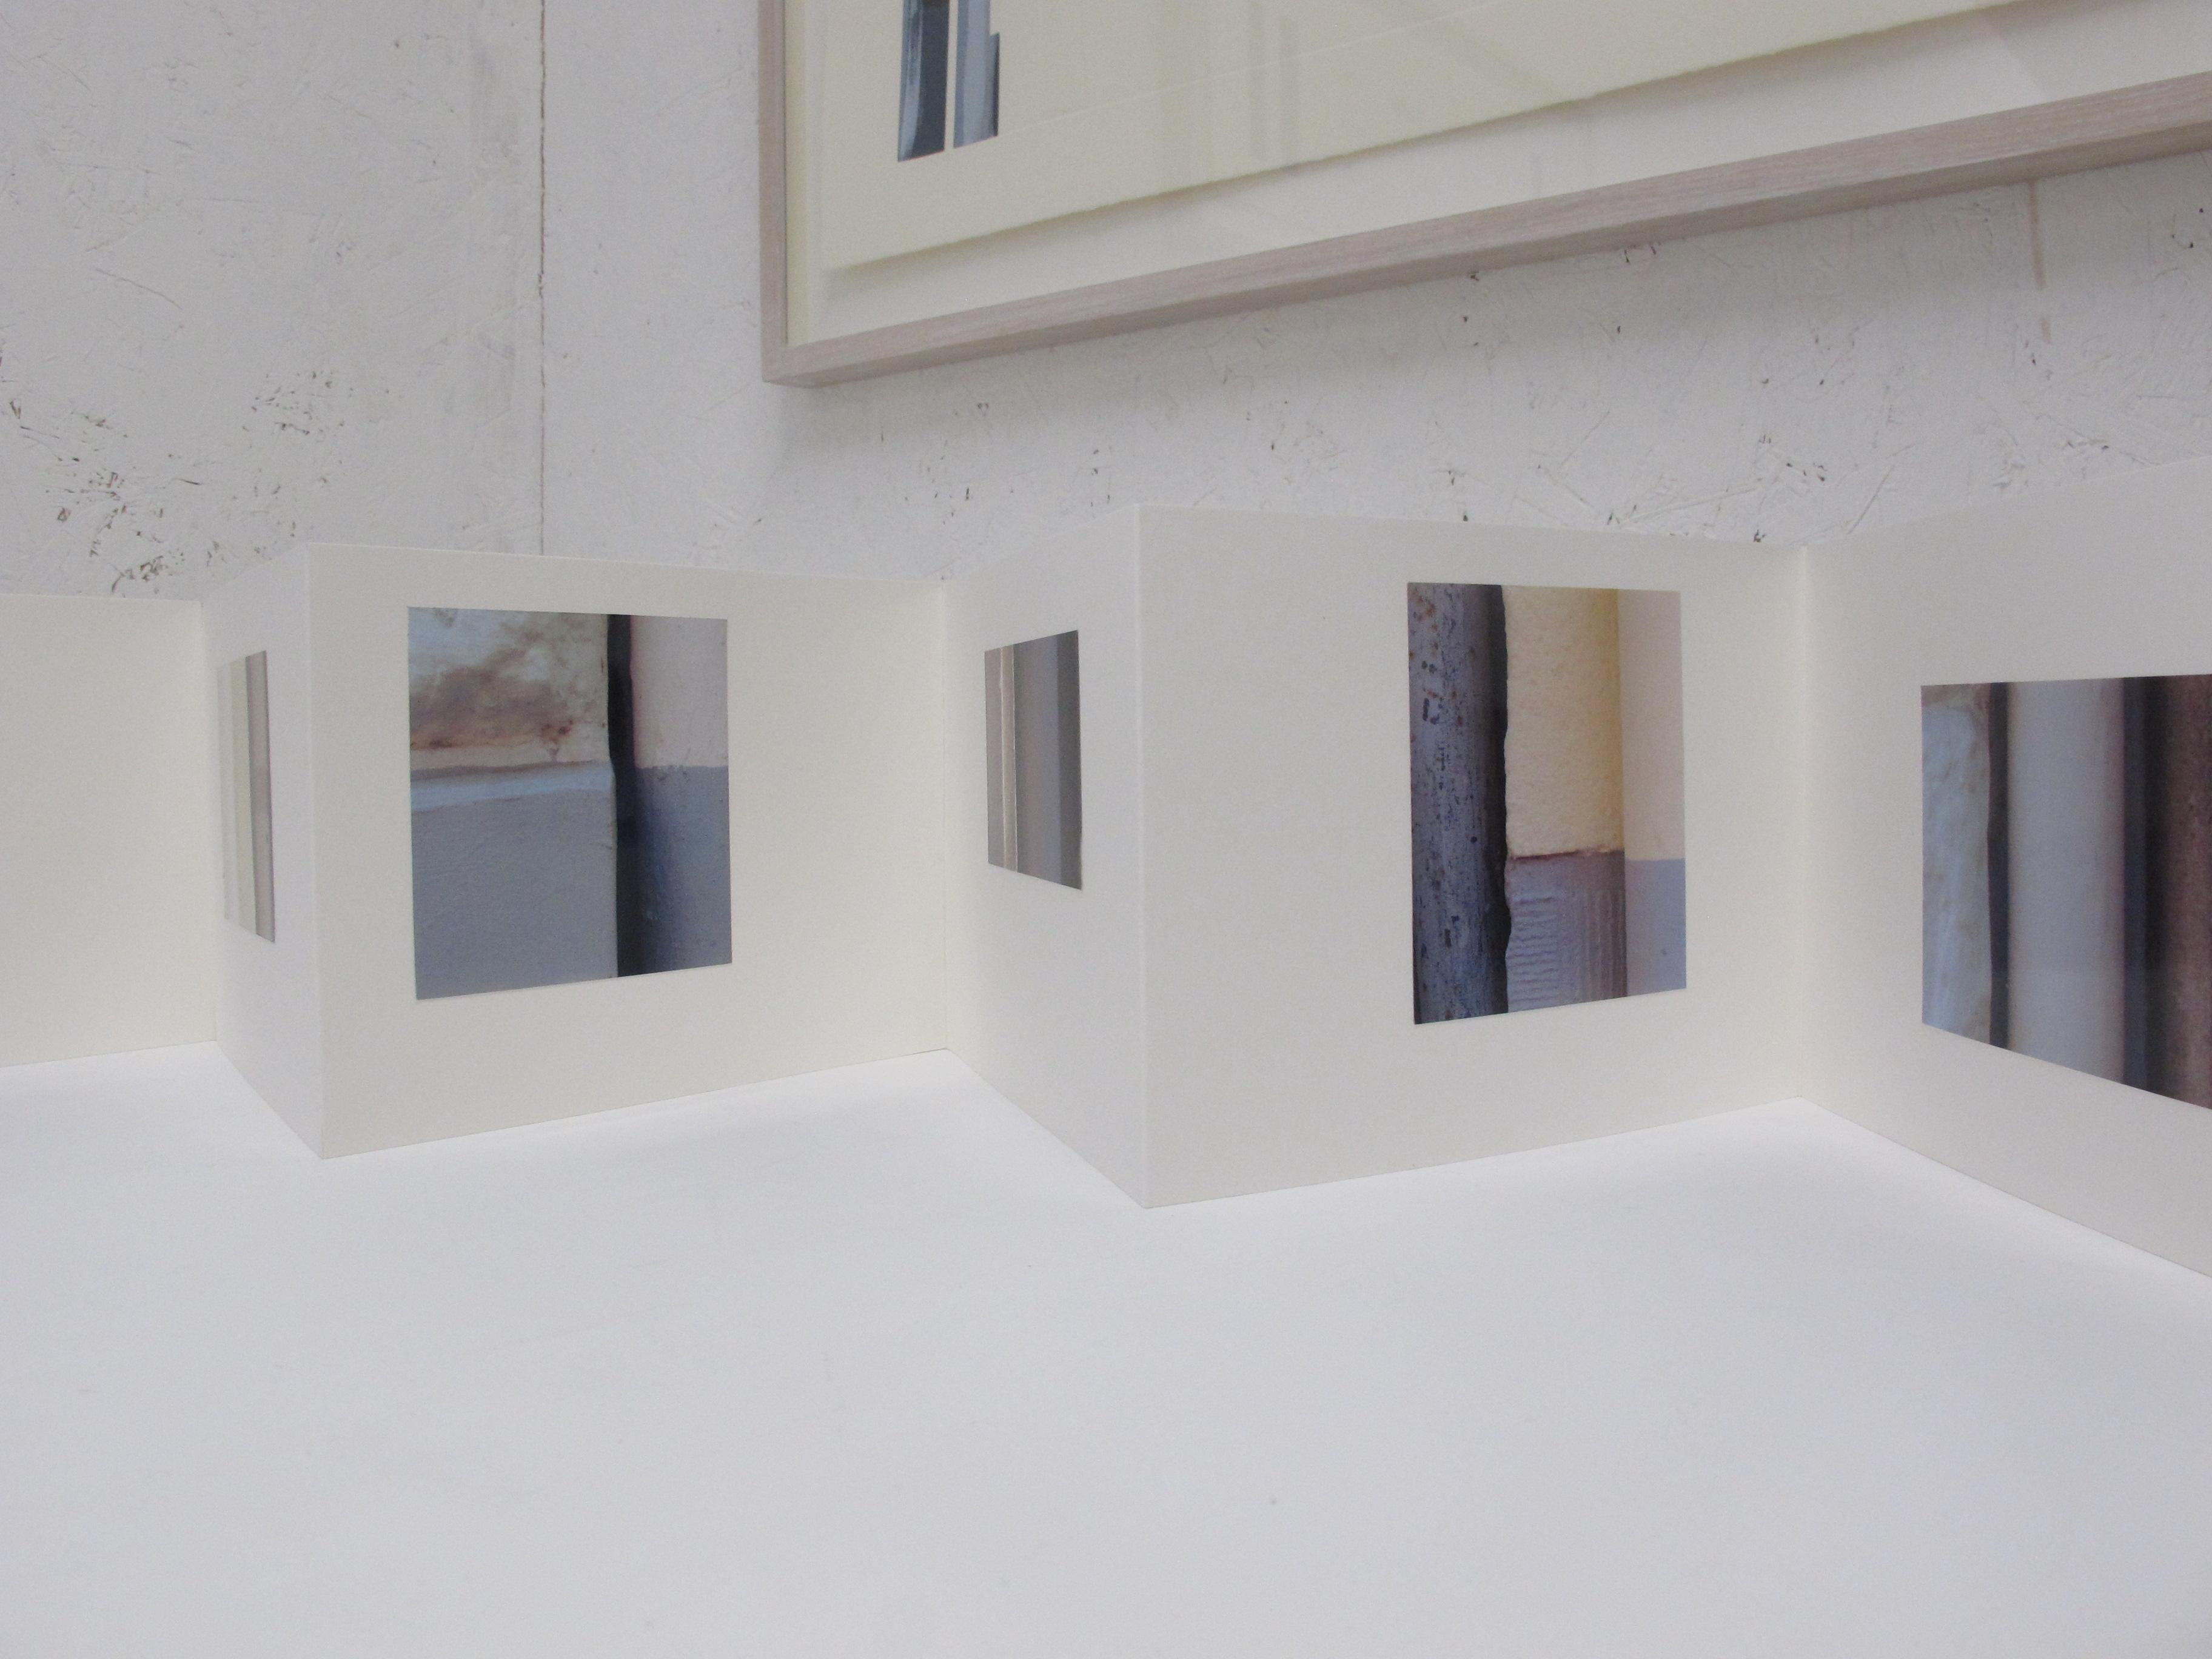 Hertha Strasse, Bookwork (Letterpress and Photography)